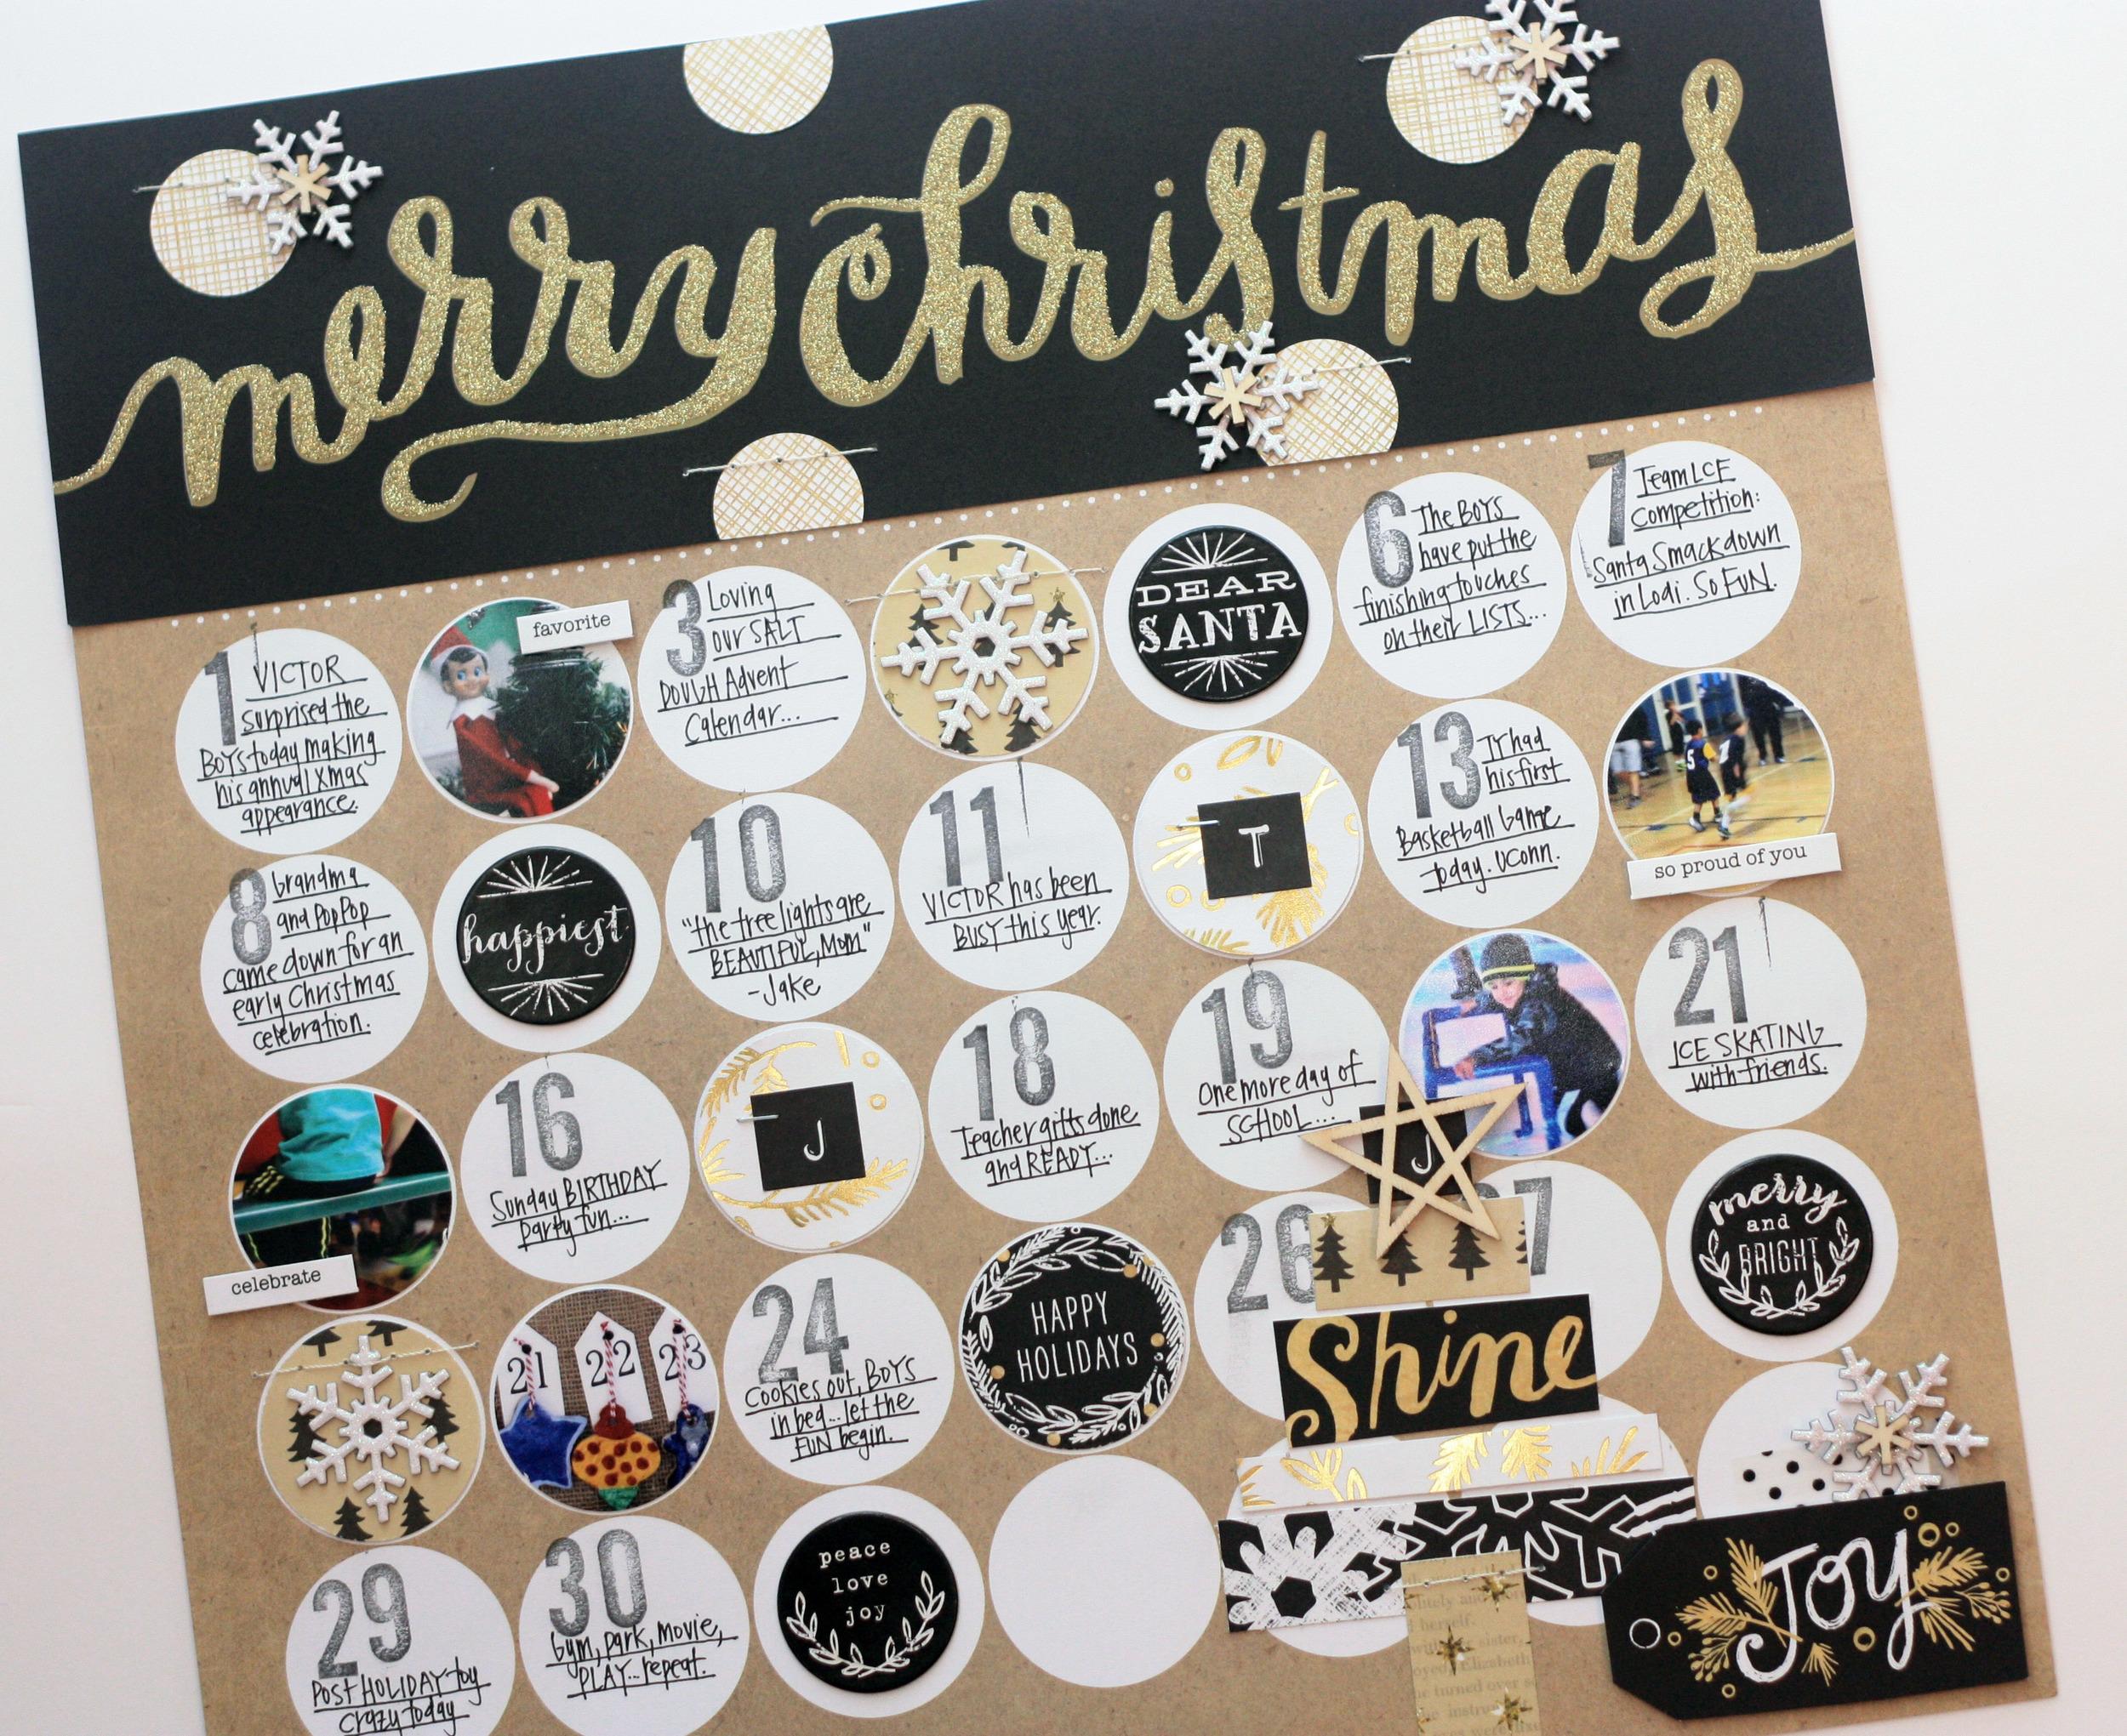 December calendar scrapbook layout by mambi design team member april orr me my big